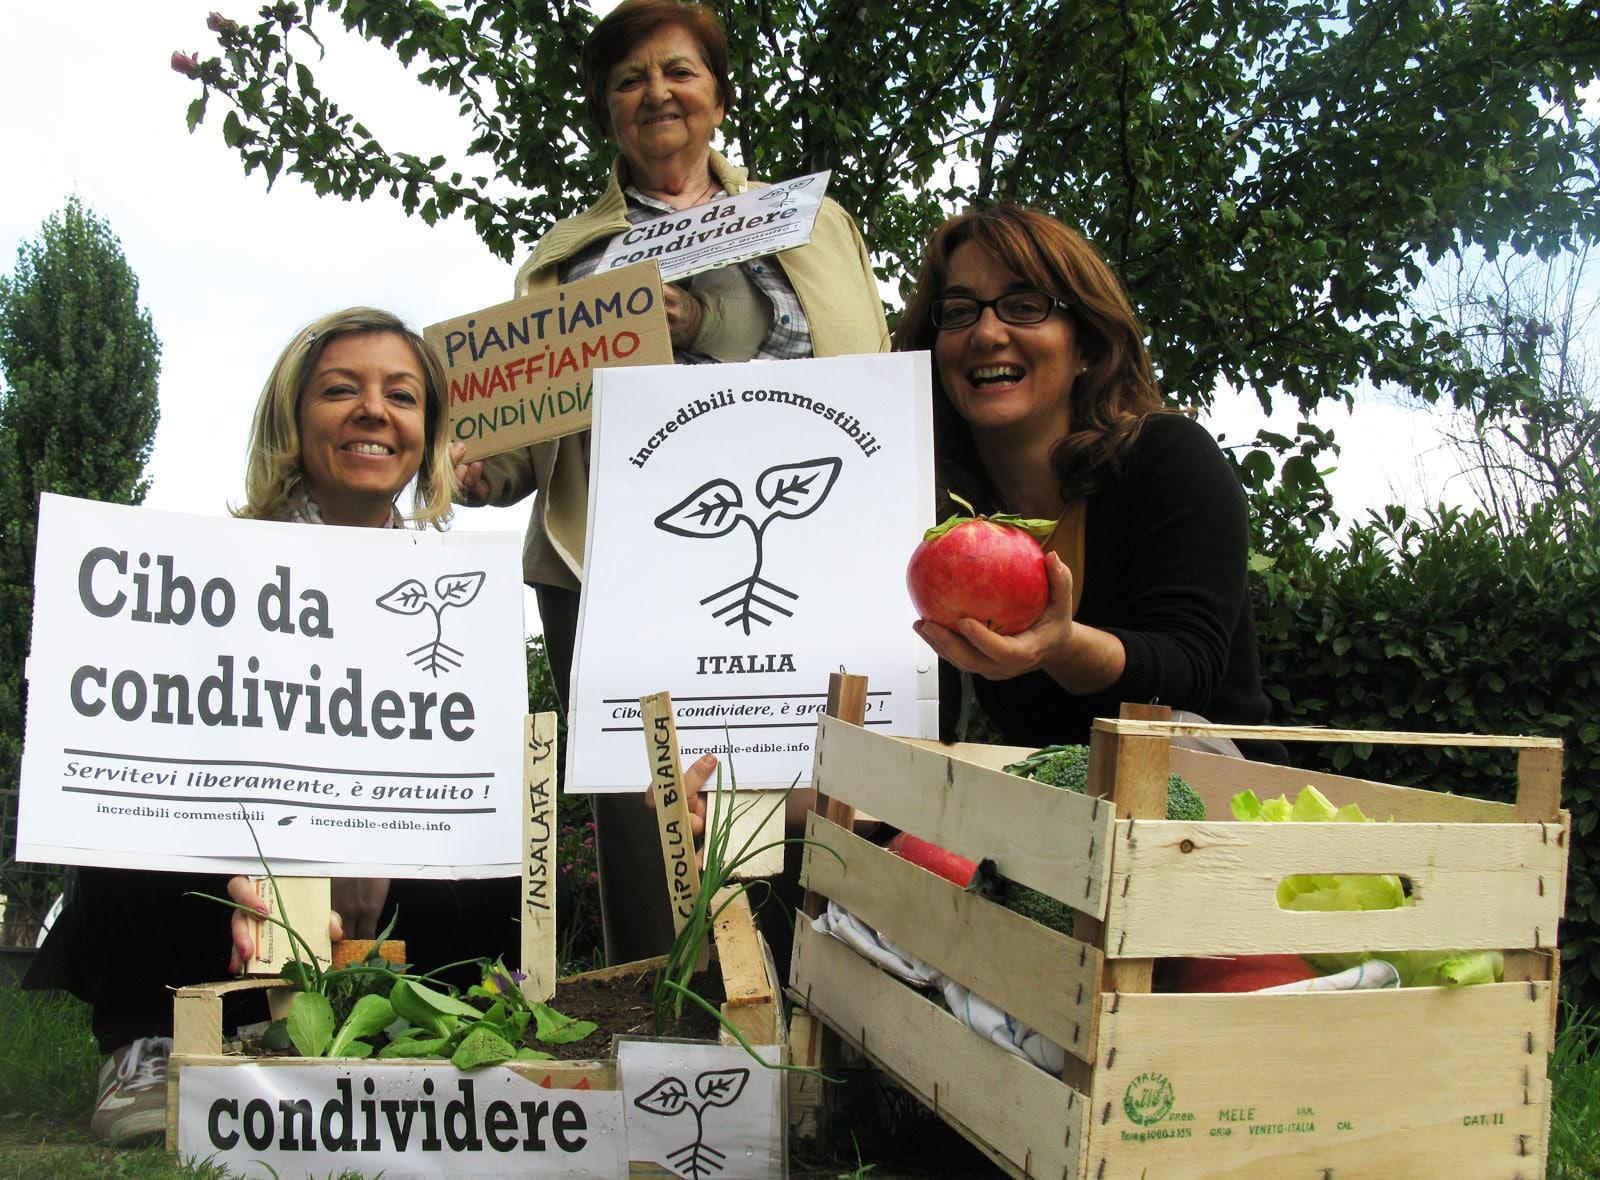 c349_incredible_edible_todmorden_italia_san-bonifacio_incredibili_commestibili_incroyables_comestibles_w1600